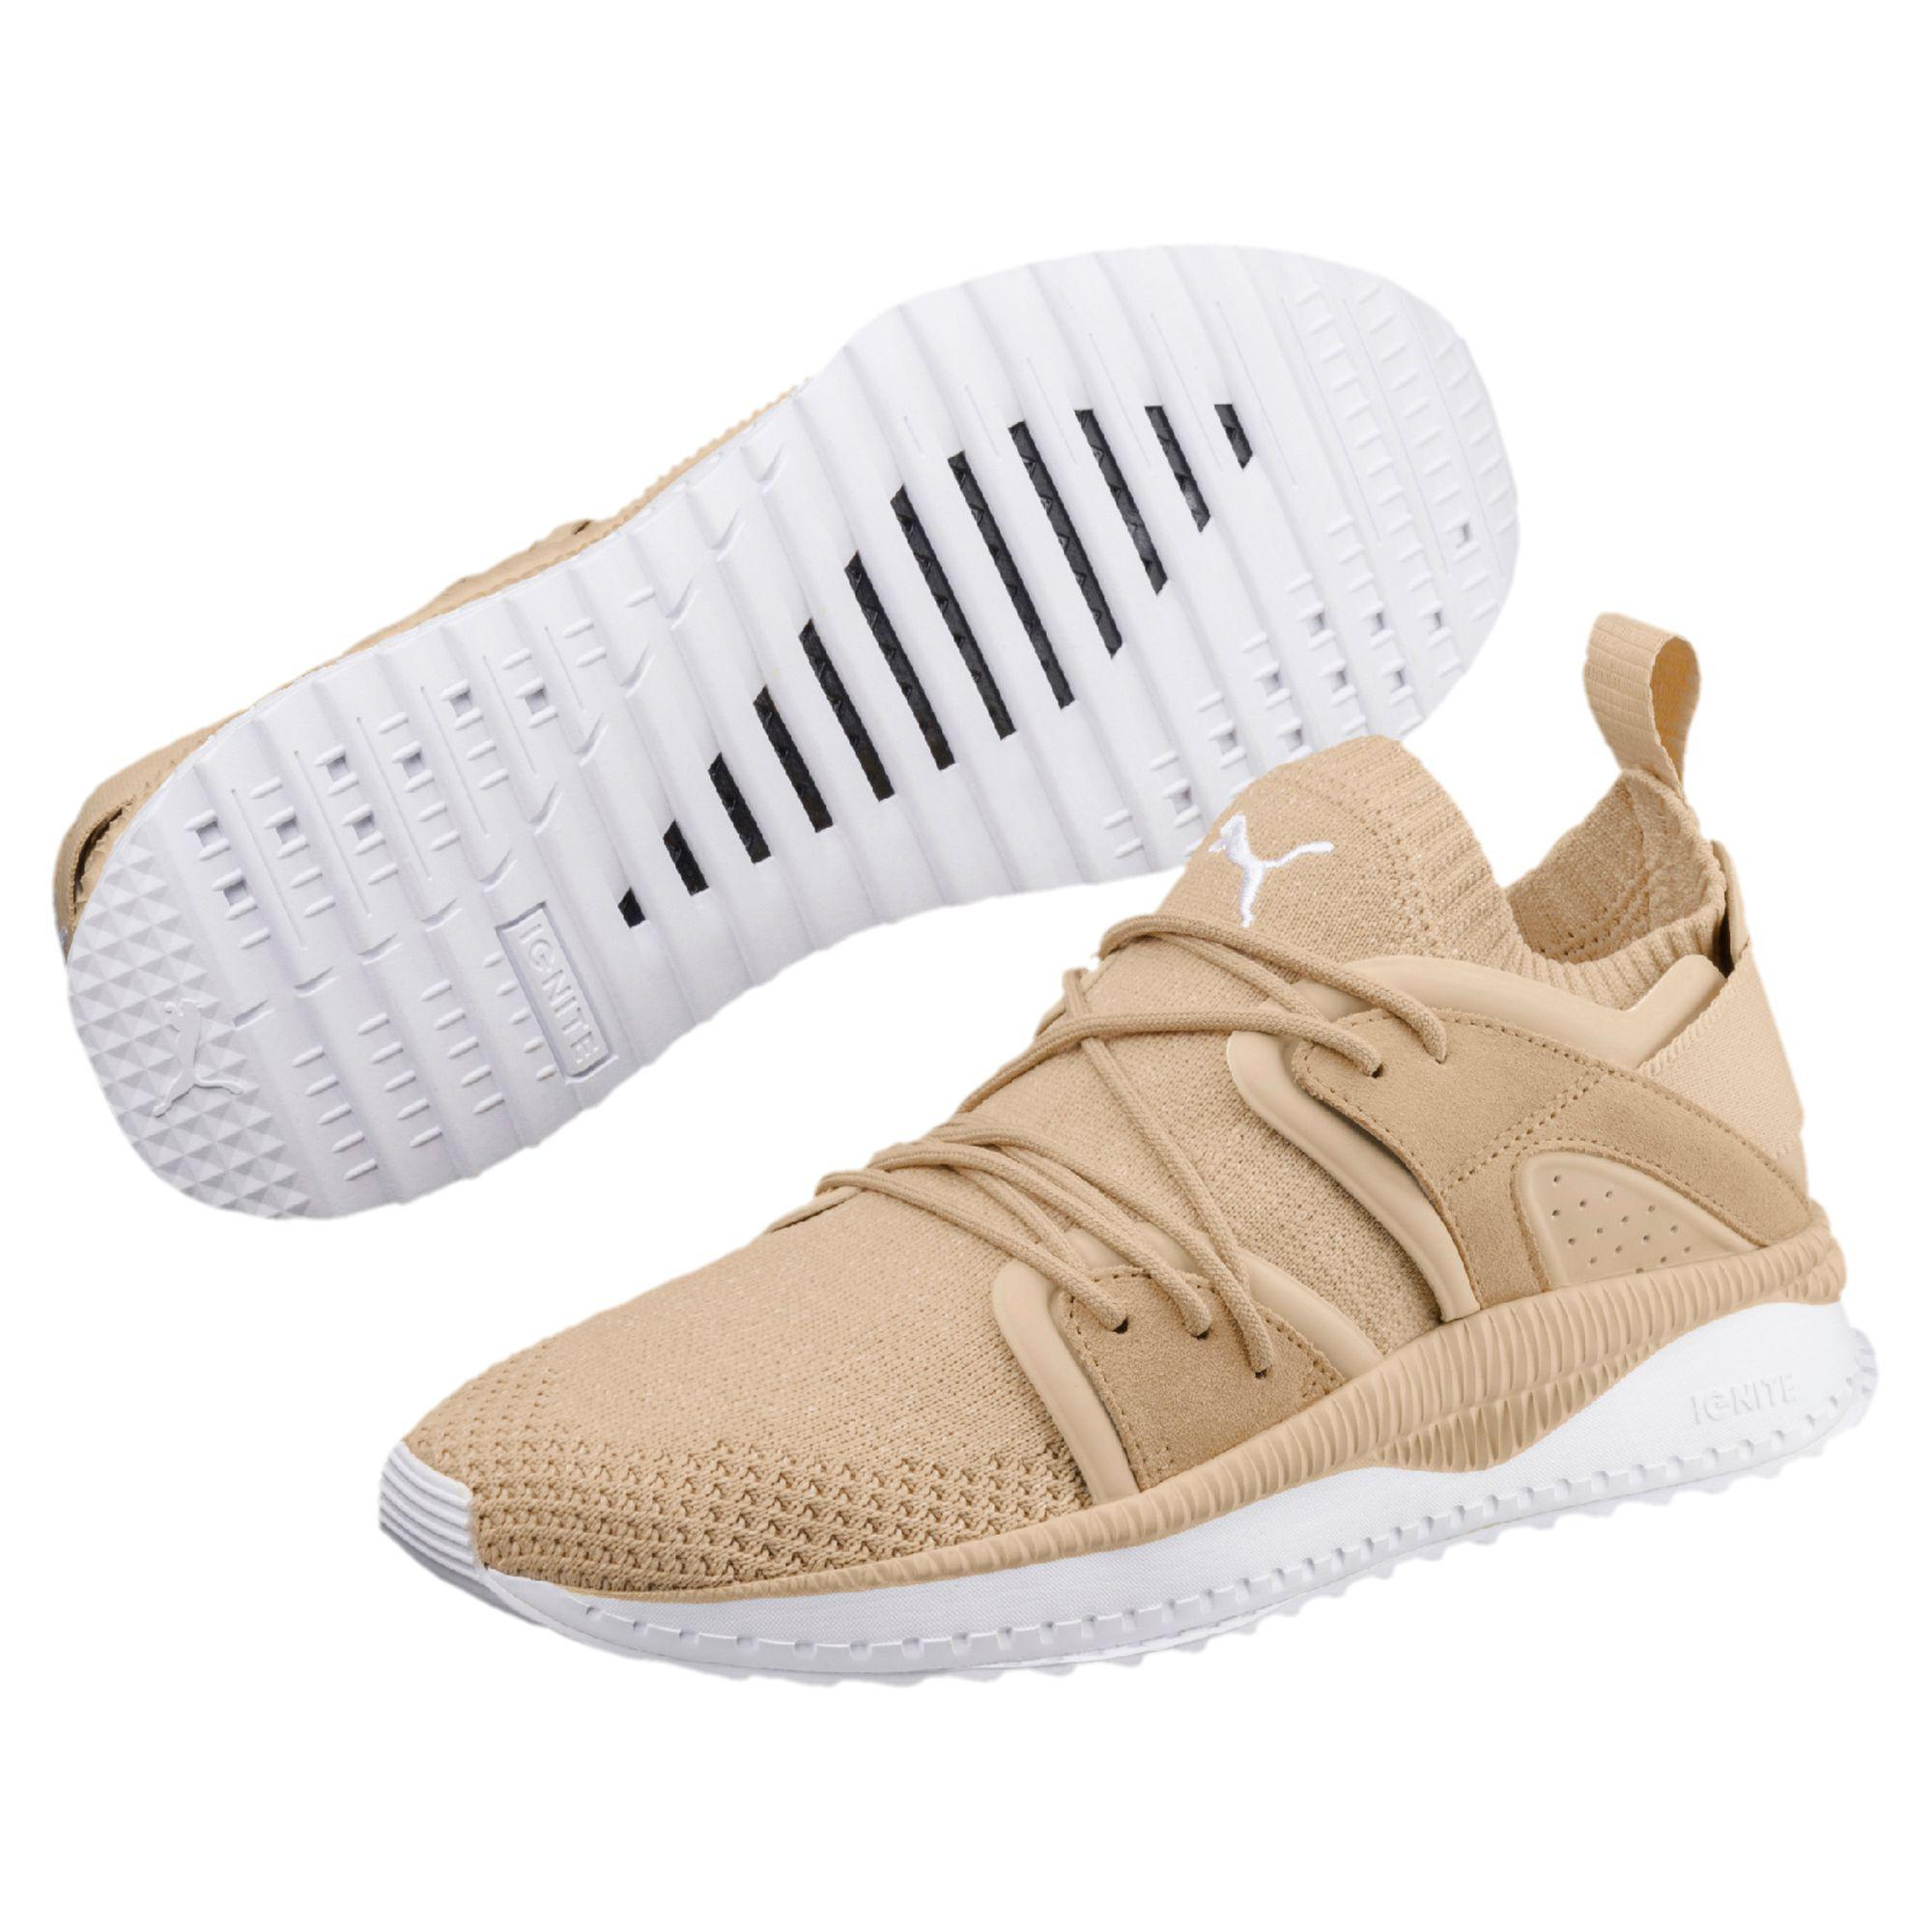 b97a3b09a191 Lyst - PUMA Tsugi Blaze Evoknit Sneakers in White for Men